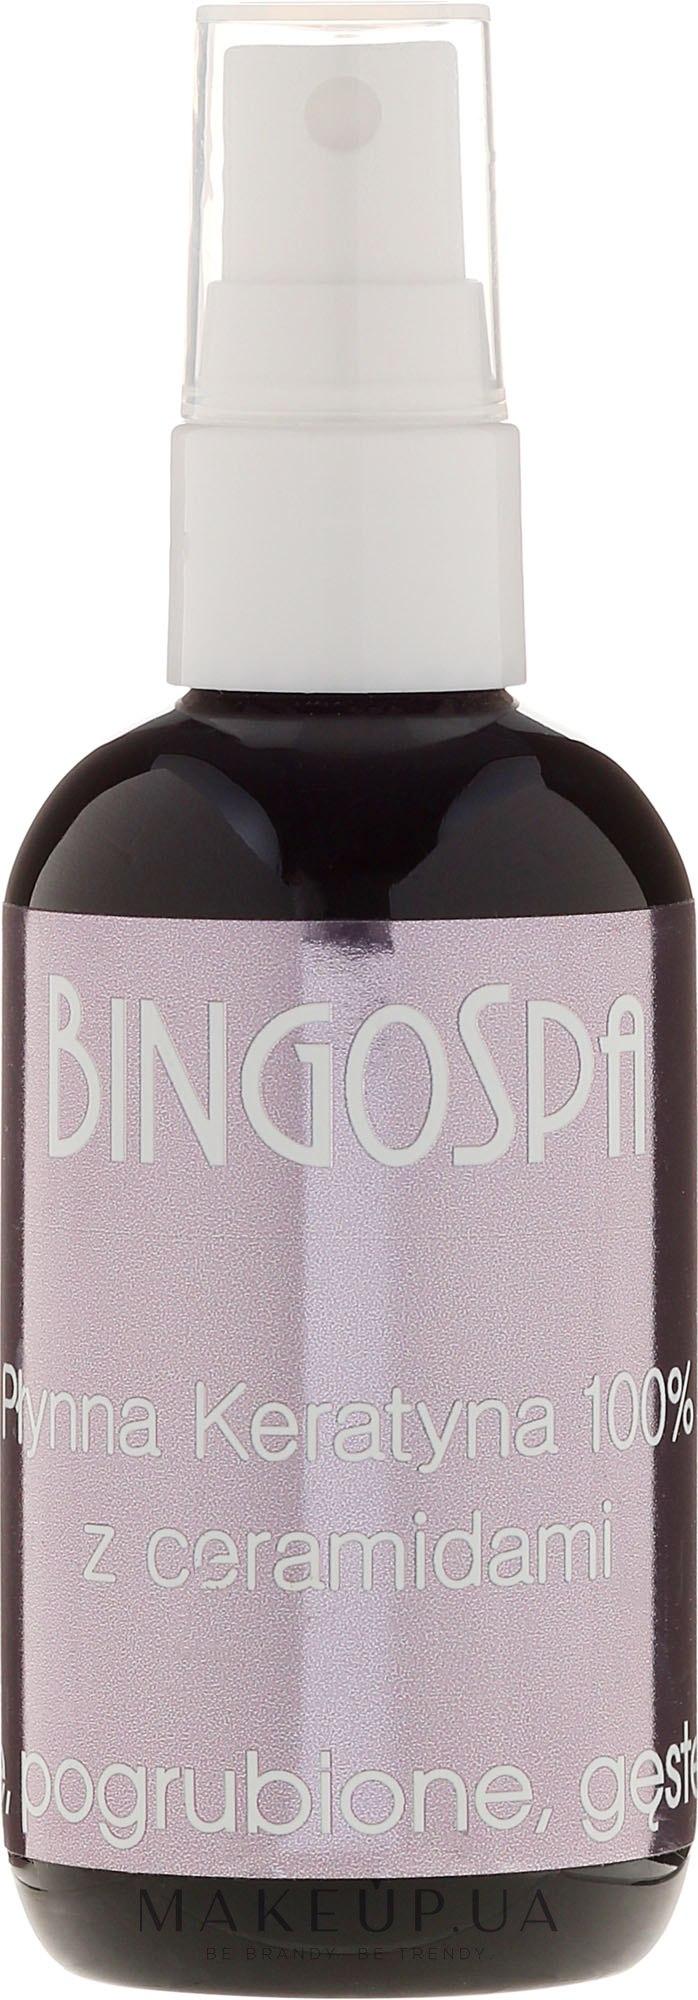 Жидкий кератин с керамидами - BingoSpa 100% Pure Liquid Keratin with Ceramides — фото 100ml